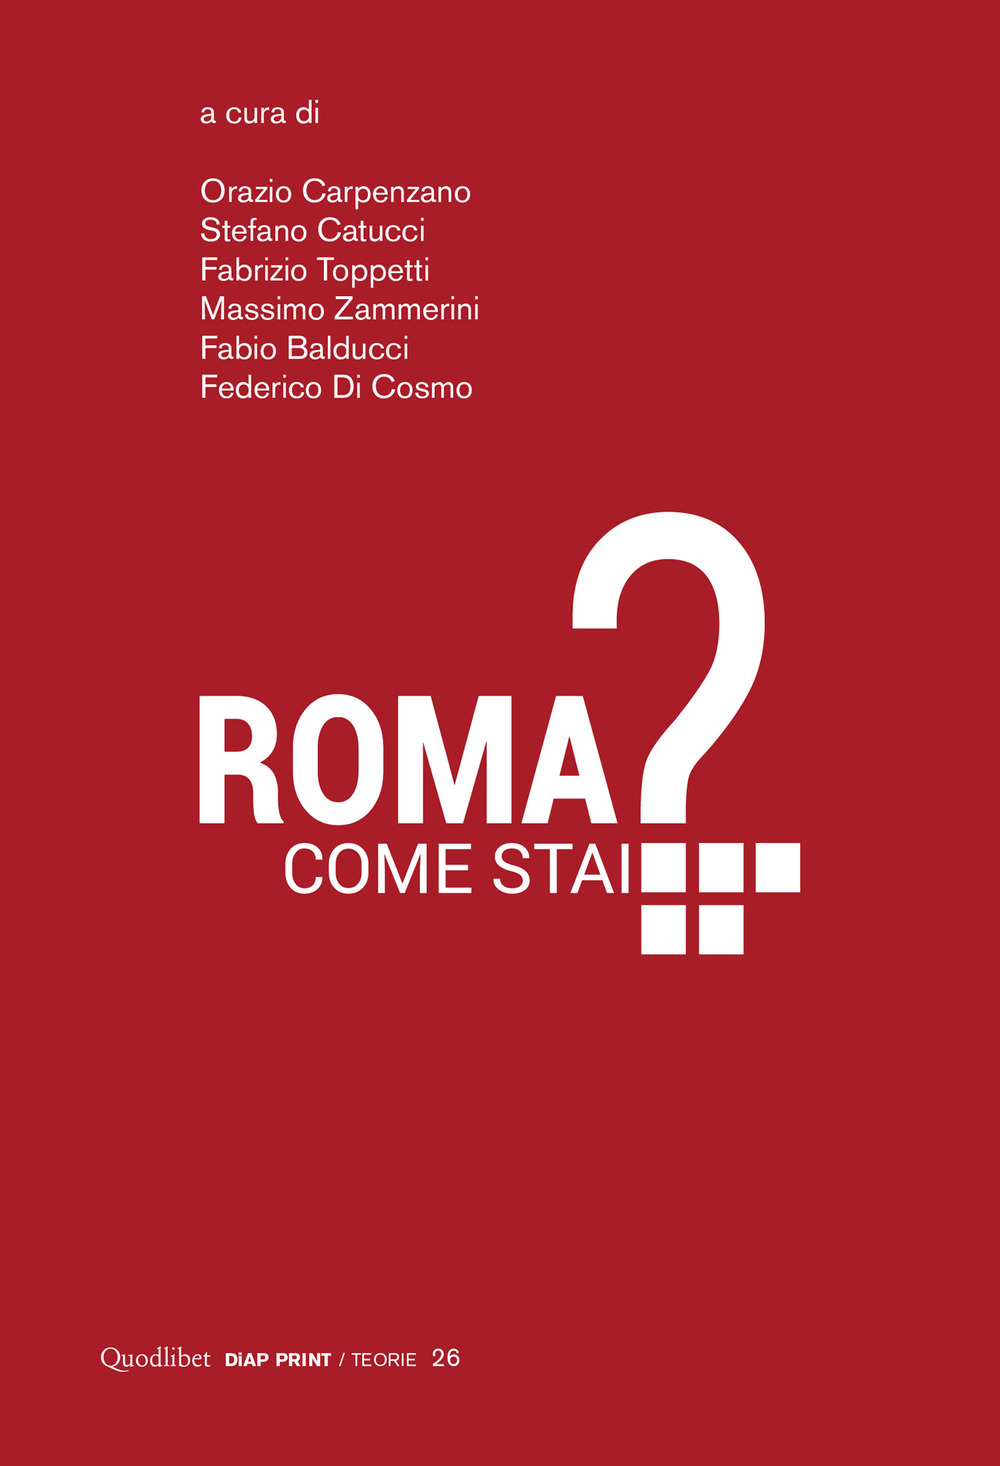 ROMA COME STAI? - AA.VV. - 9788822907127